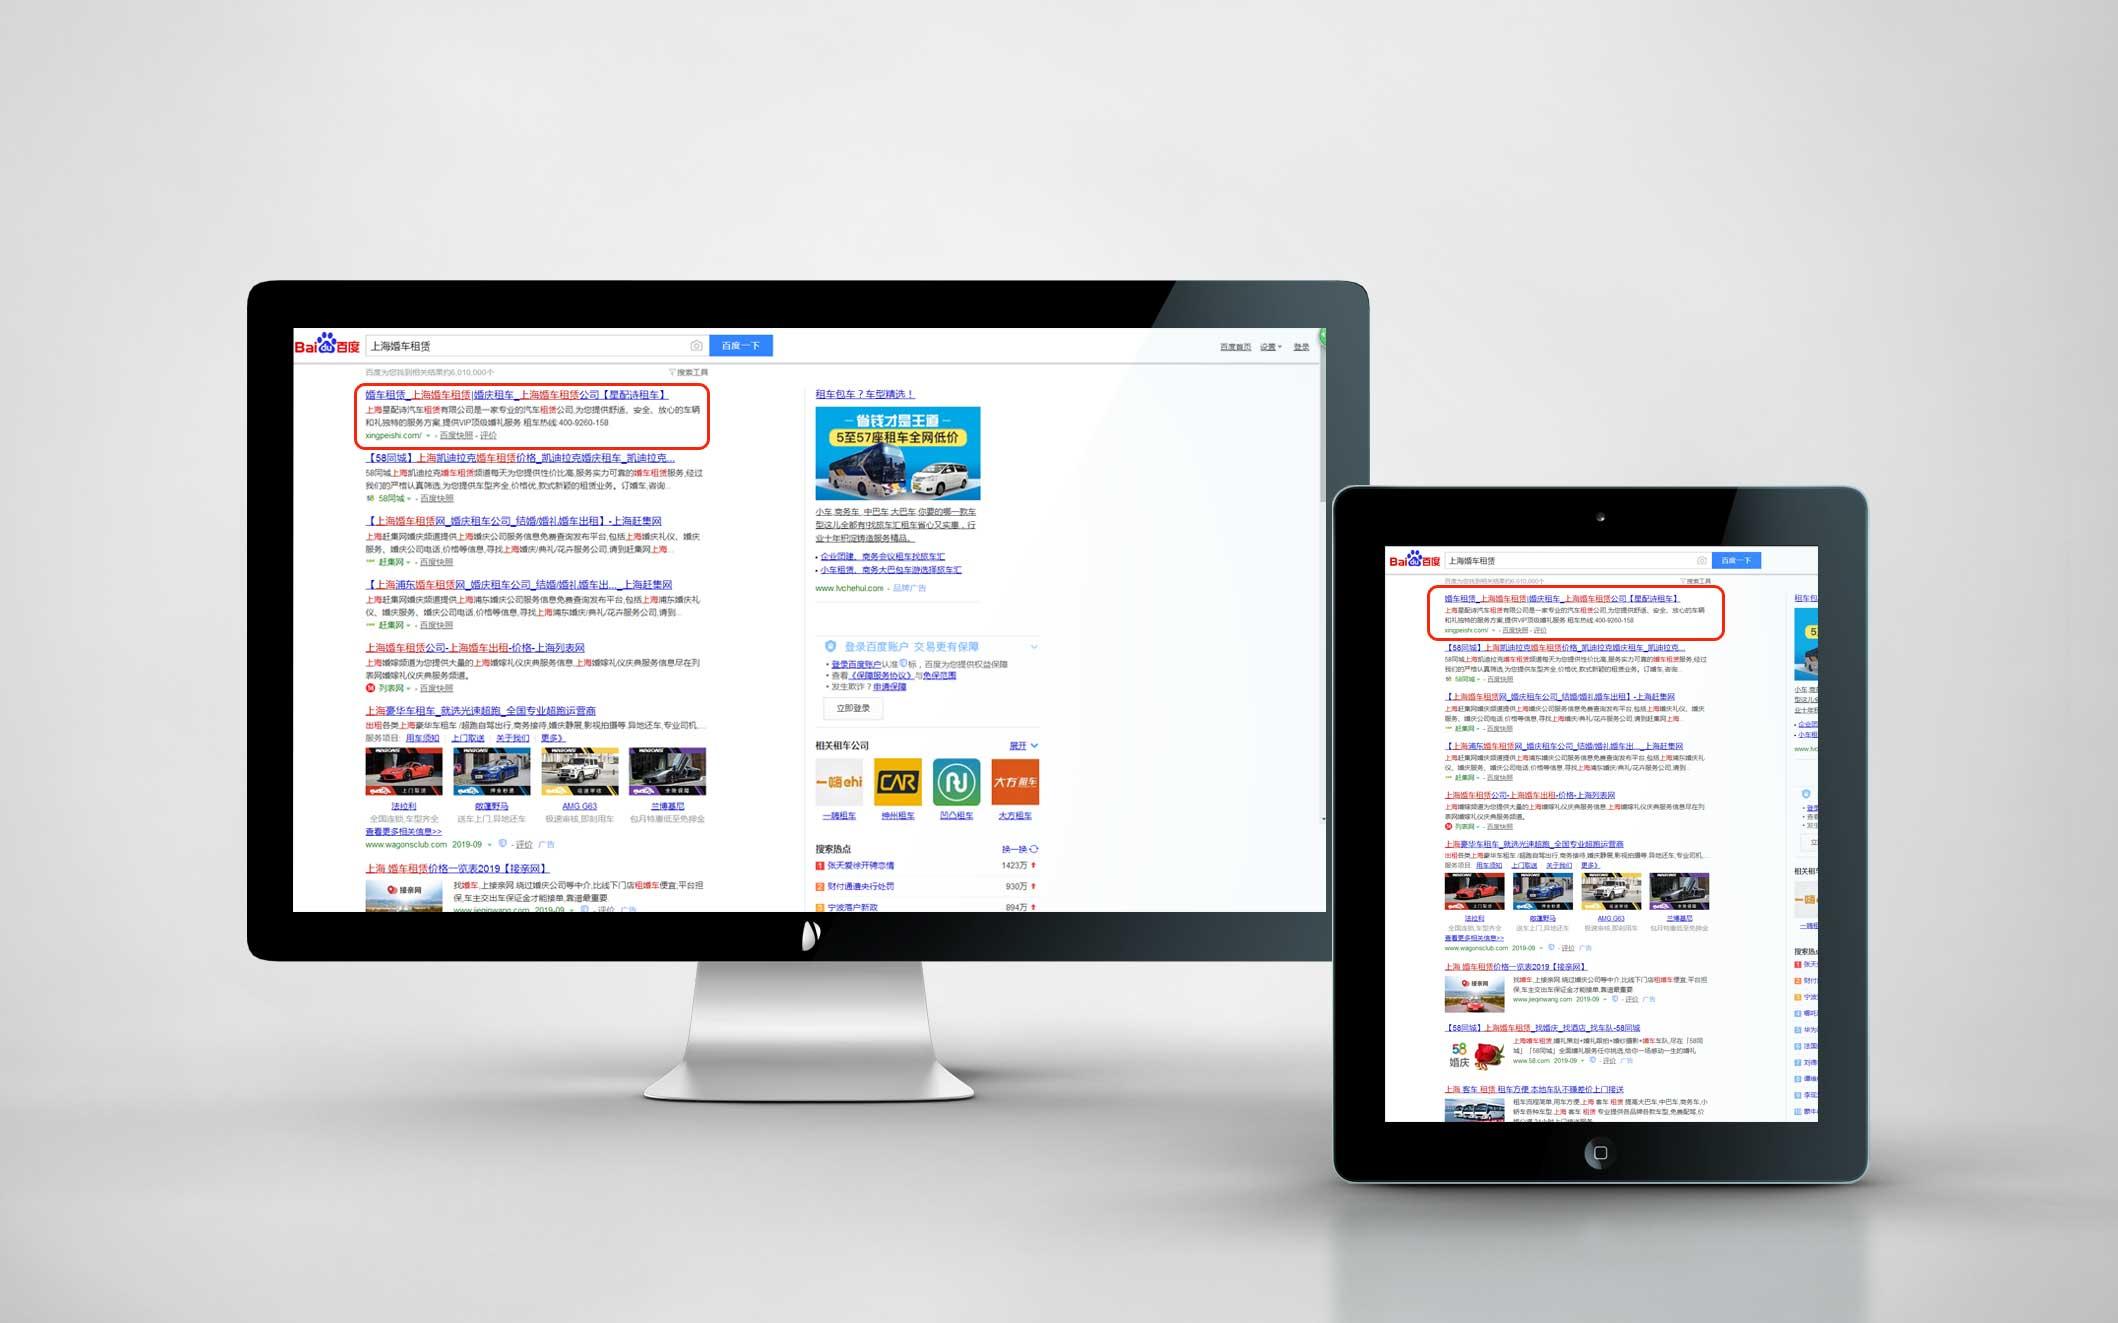 [SEO优化]快速排名百度优化网络营销整合营销品牌营销全案